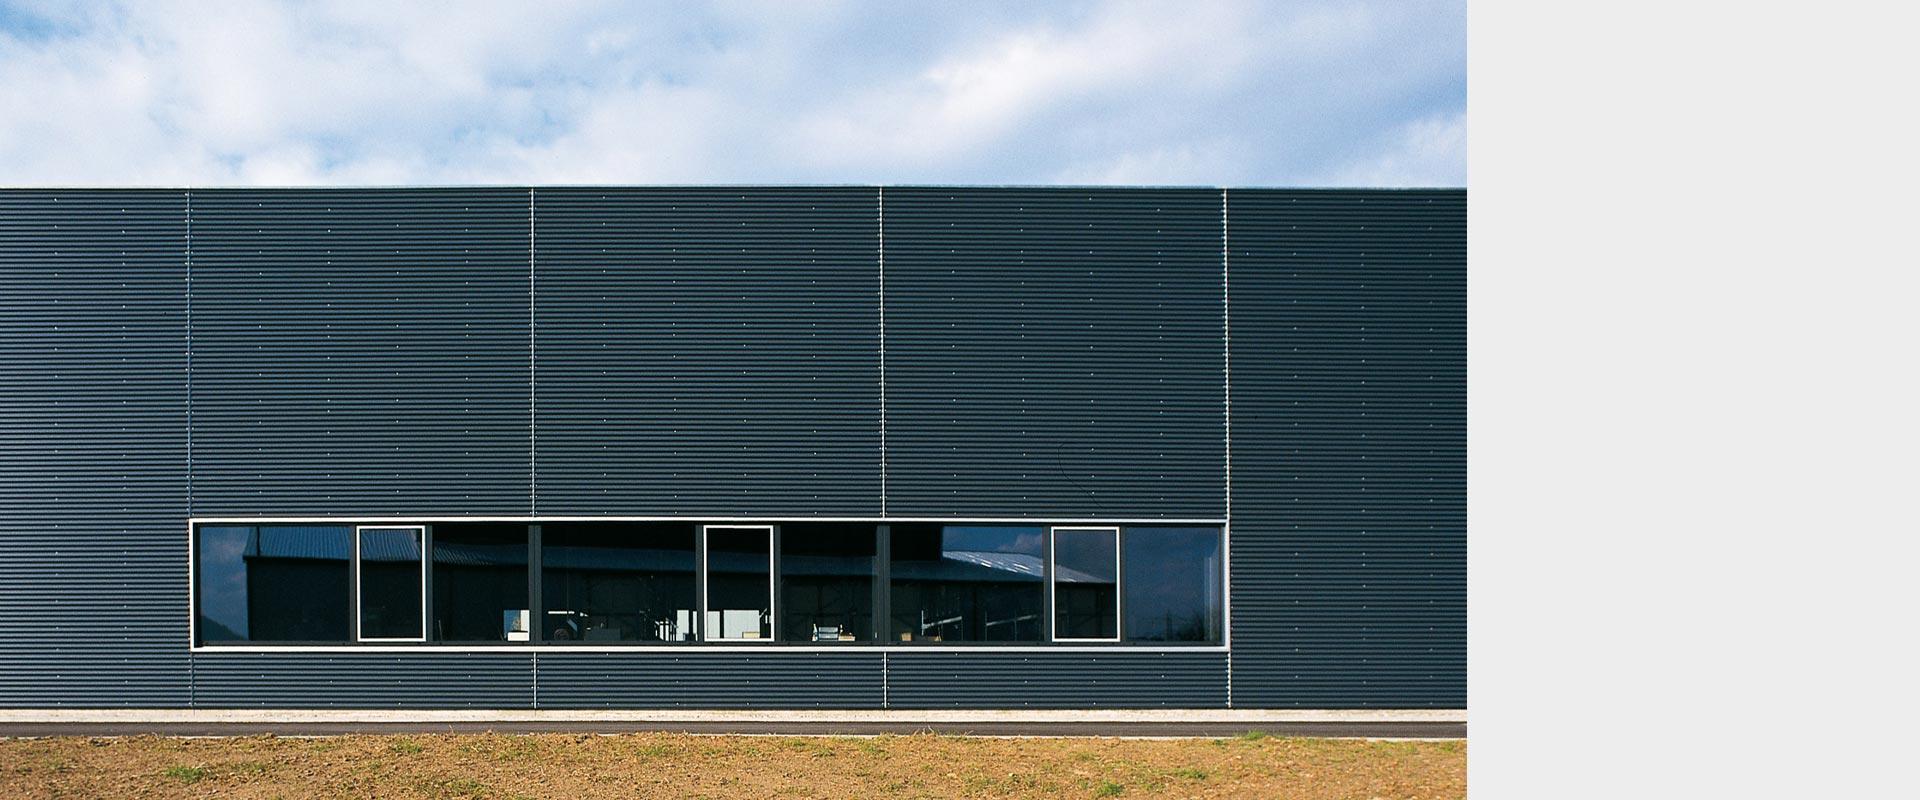 architekturbuero_henning_musahl_waldshut_ragman03